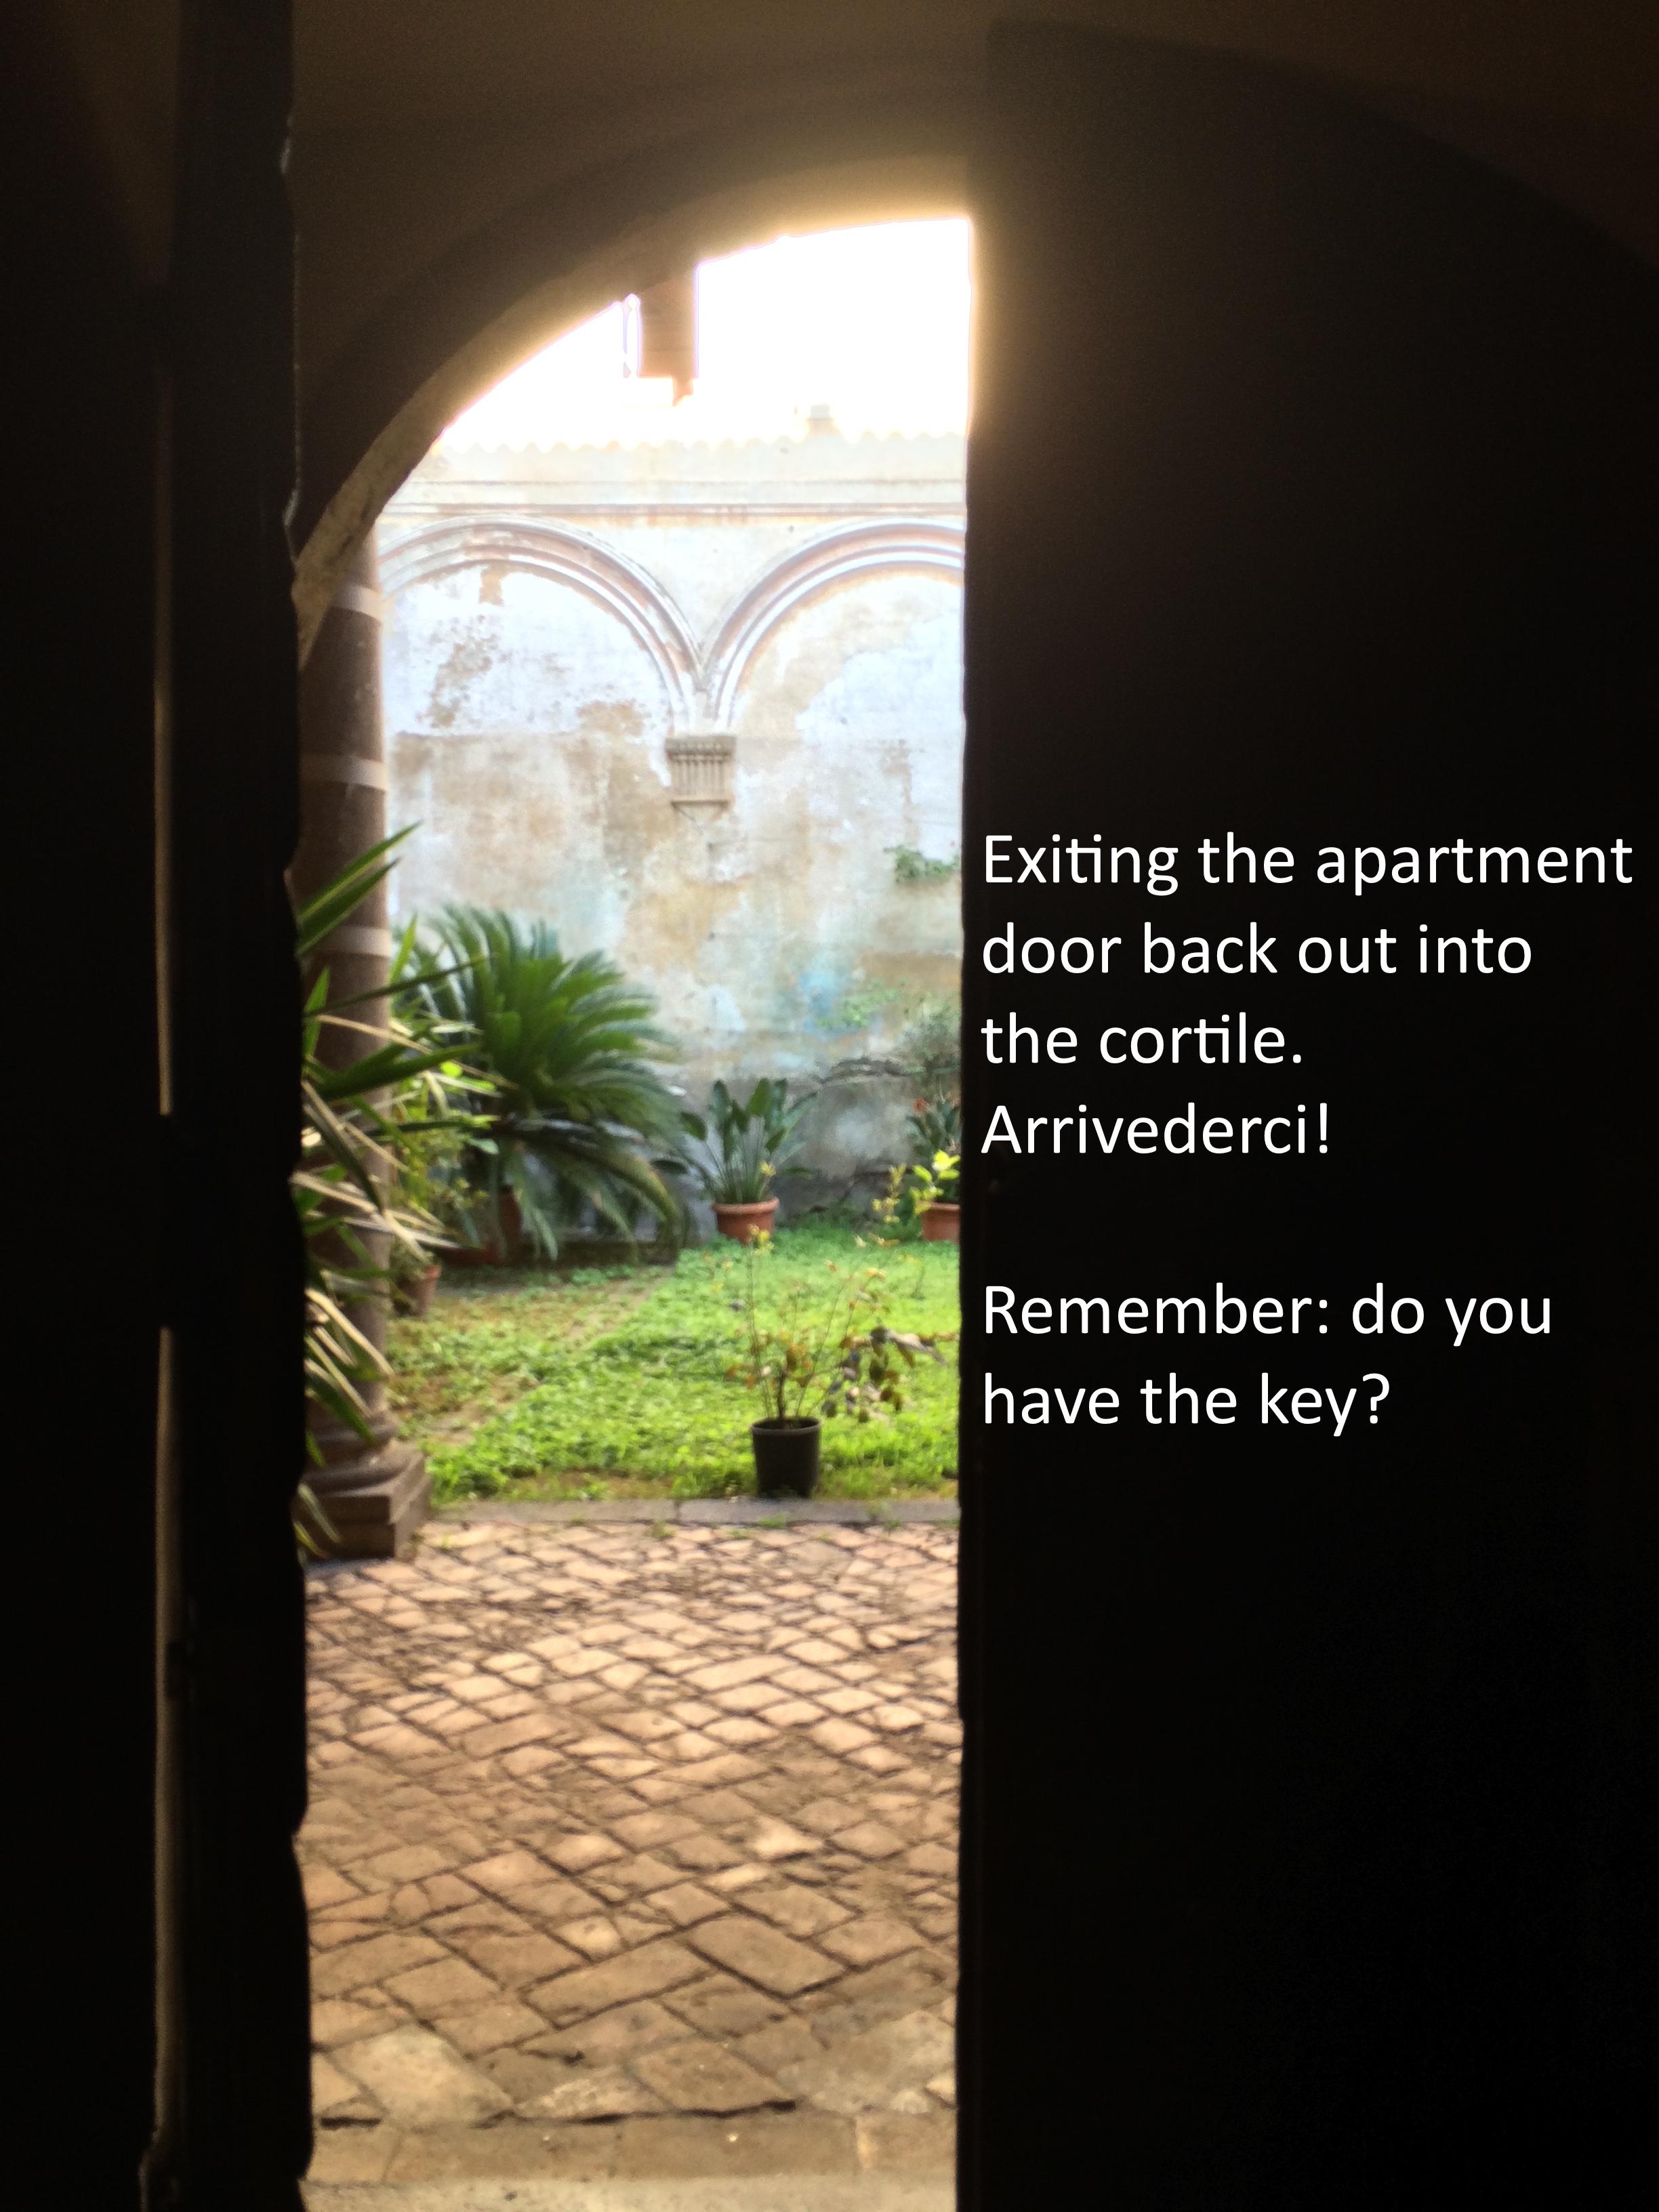 #32 Exiting the apartment door Arrivederci!.JPG